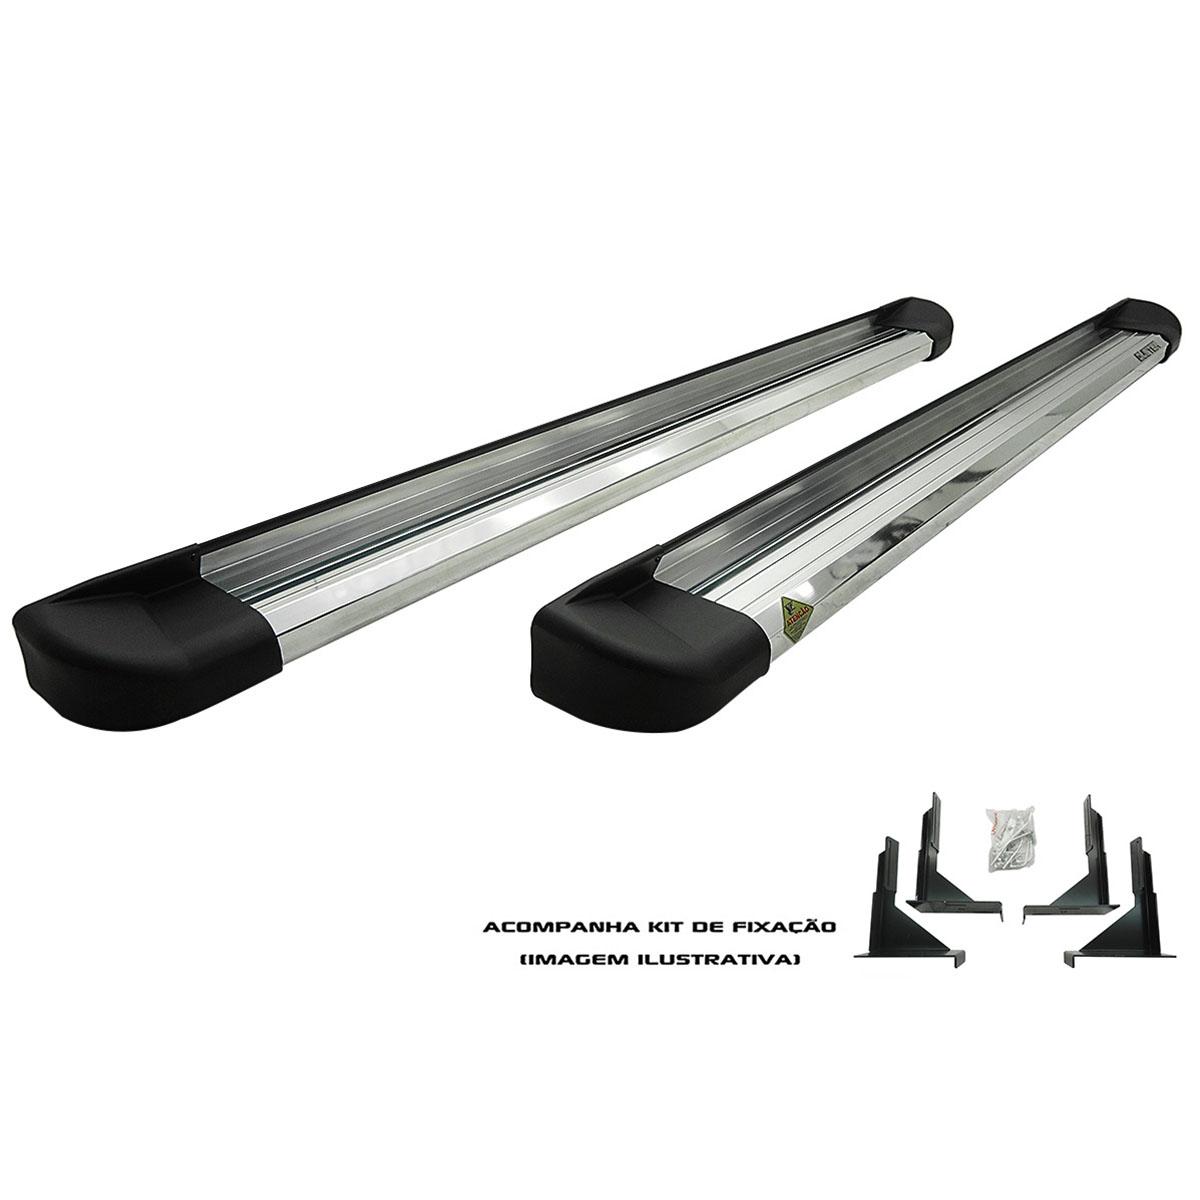 Estribo plataforma alumínio L200 Triton 2008 a 2018